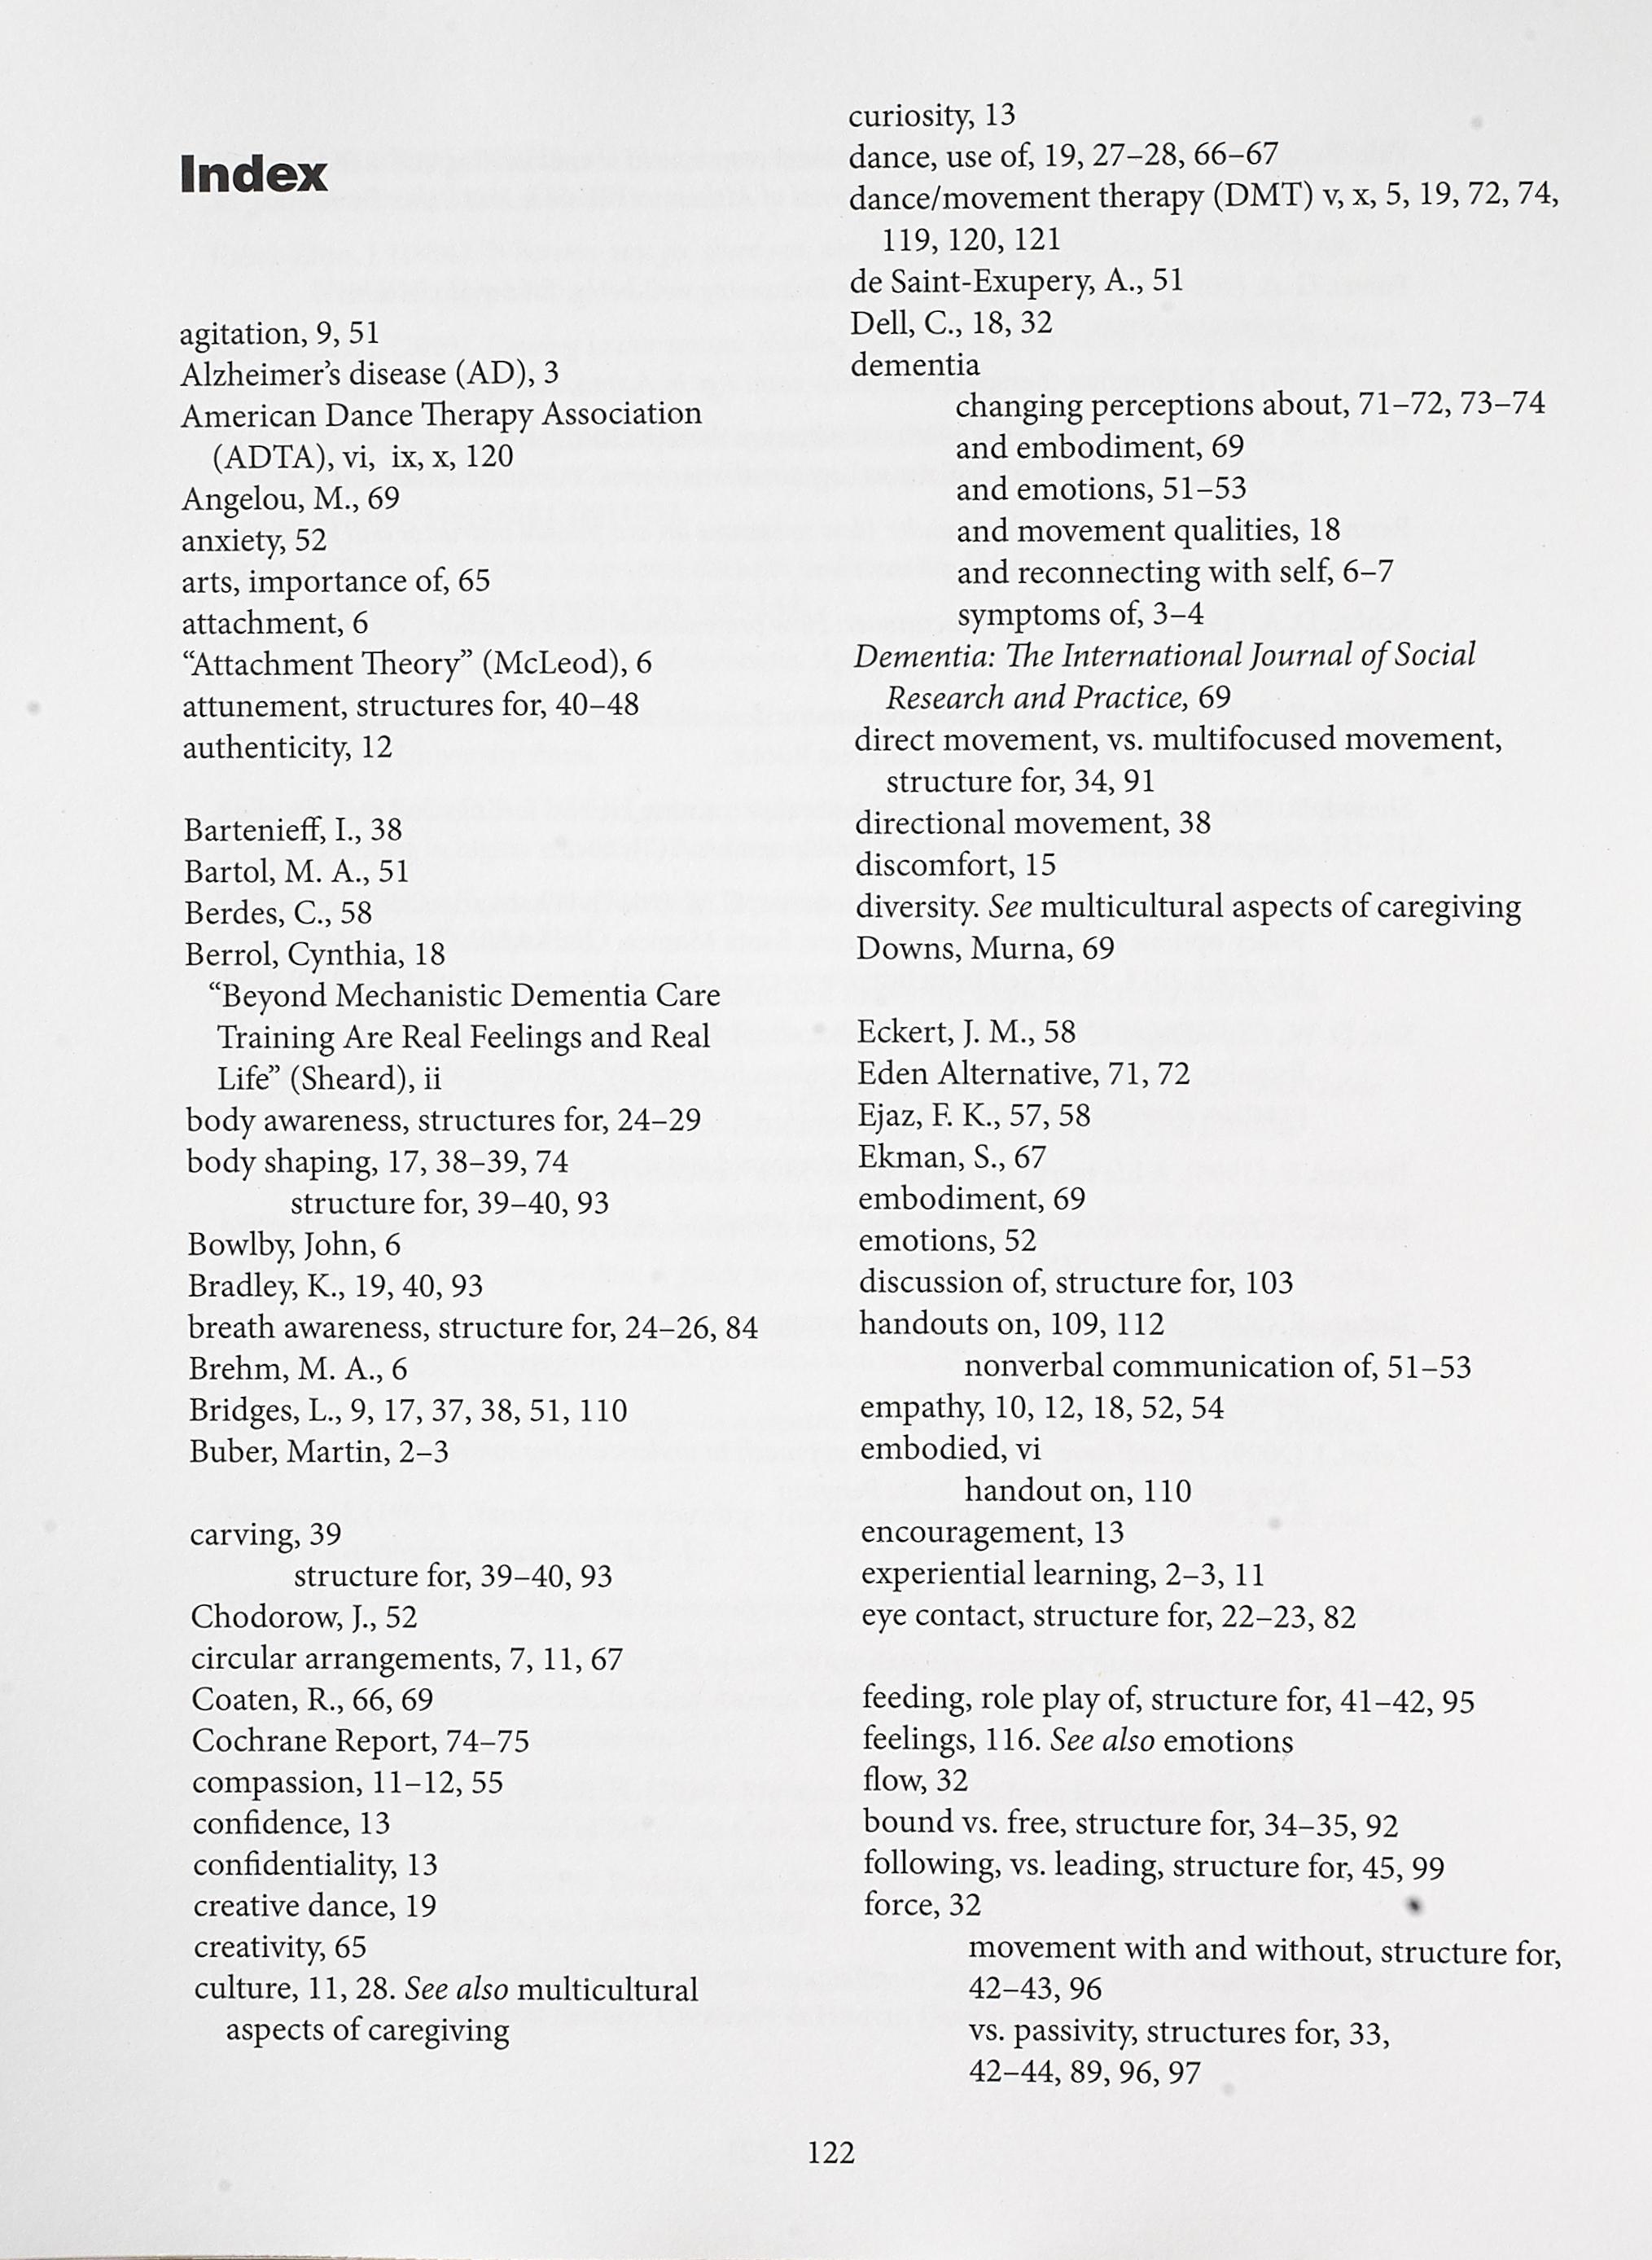 Index-1.jpg